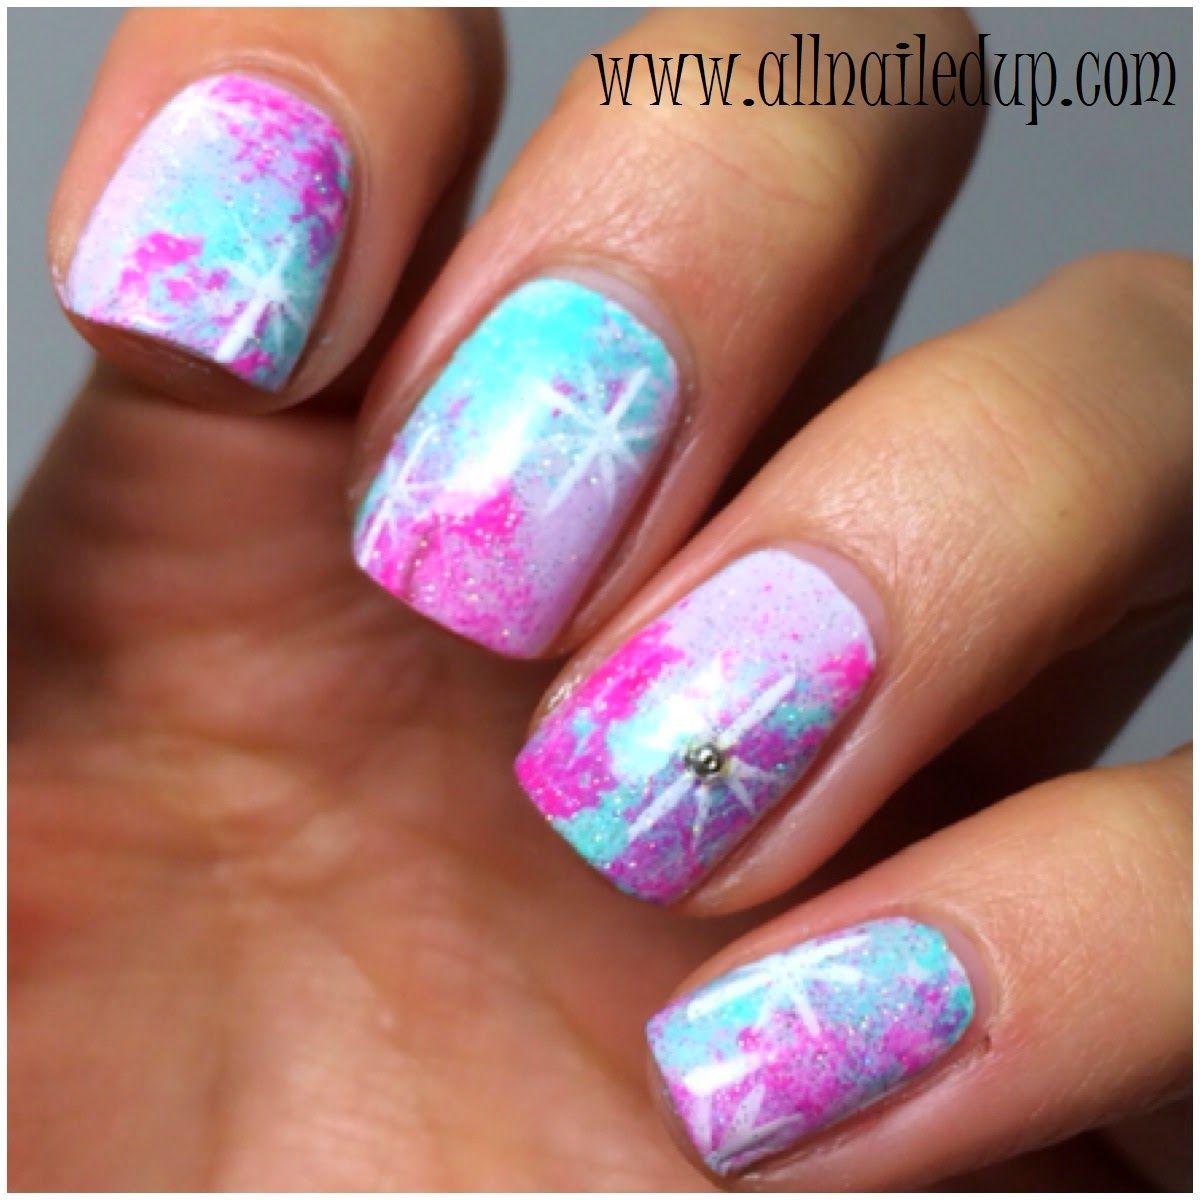 A different take on Galaxy nails | Nails | Pinterest | Galaxy nail ...